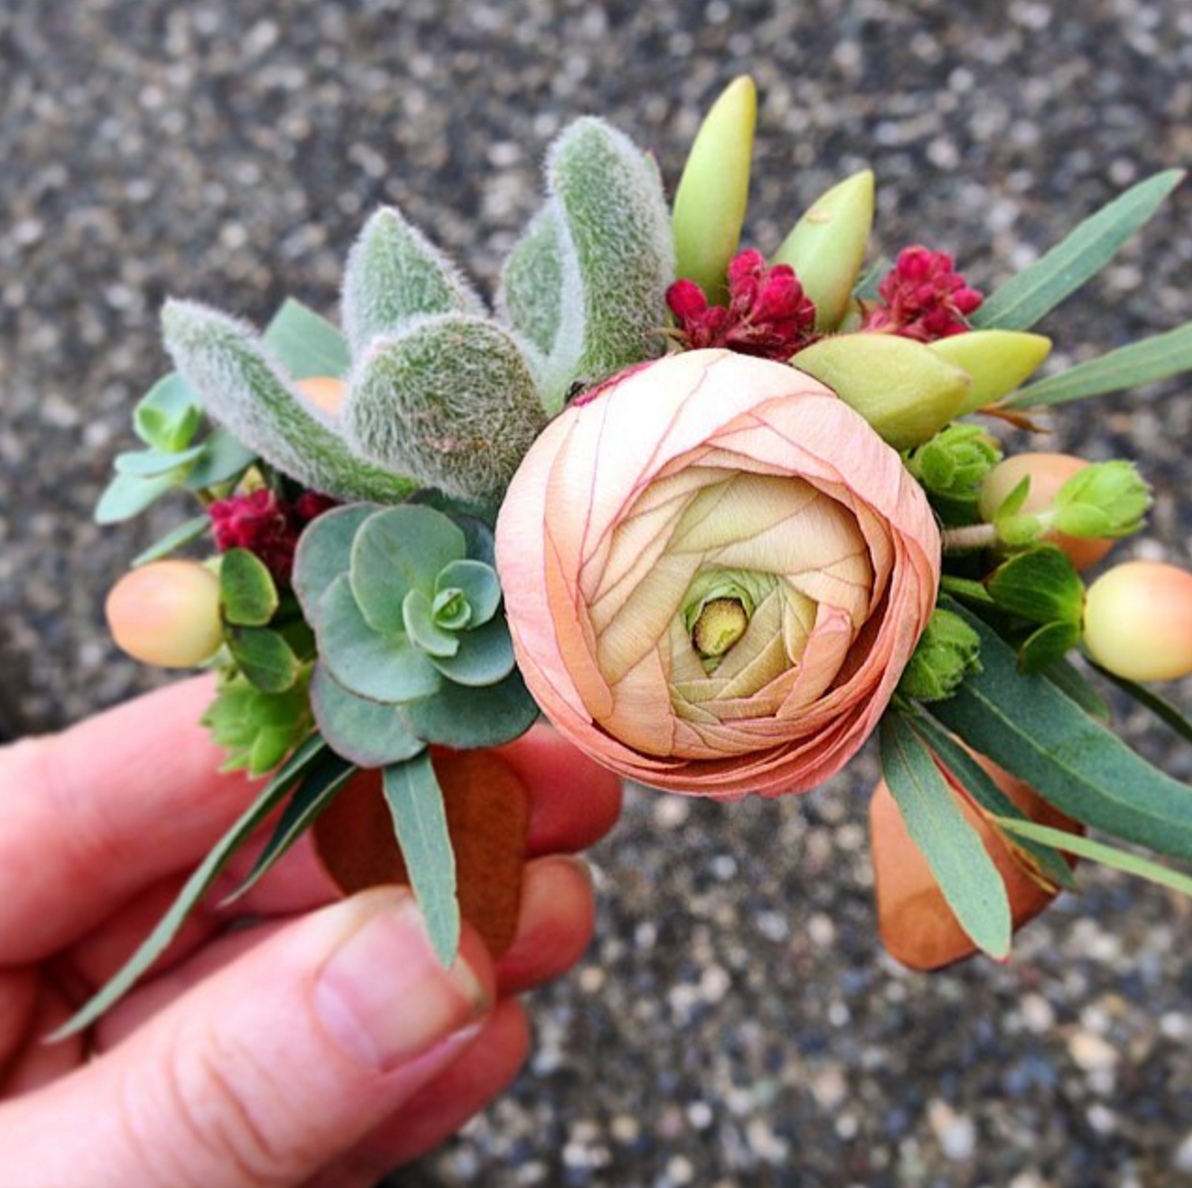 floral cuff / flower bracelet by Flourish Floral Design Blog of Mayesh Wholesale Florist - #MayeshFloralFashion Instagram Challenge Recap